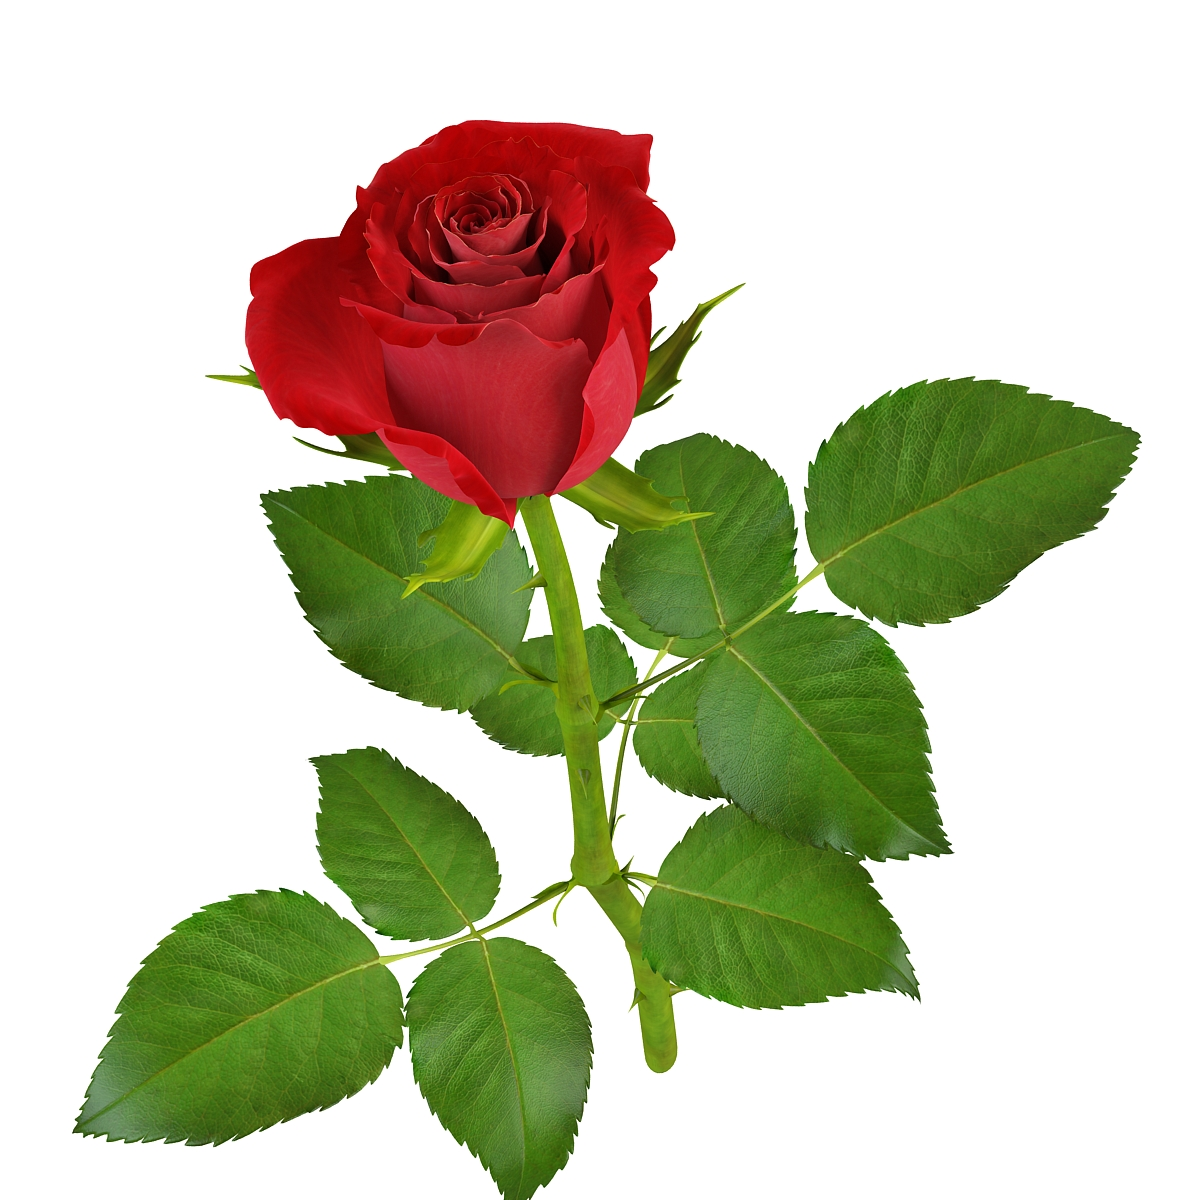 http://2.bp.blogspot.com/-WAKIZ80WOCM/TZYoYhEXzAI/AAAAAAAAAi4/CbAI-OK2fv8/s1600/rose11_1_4.jpg